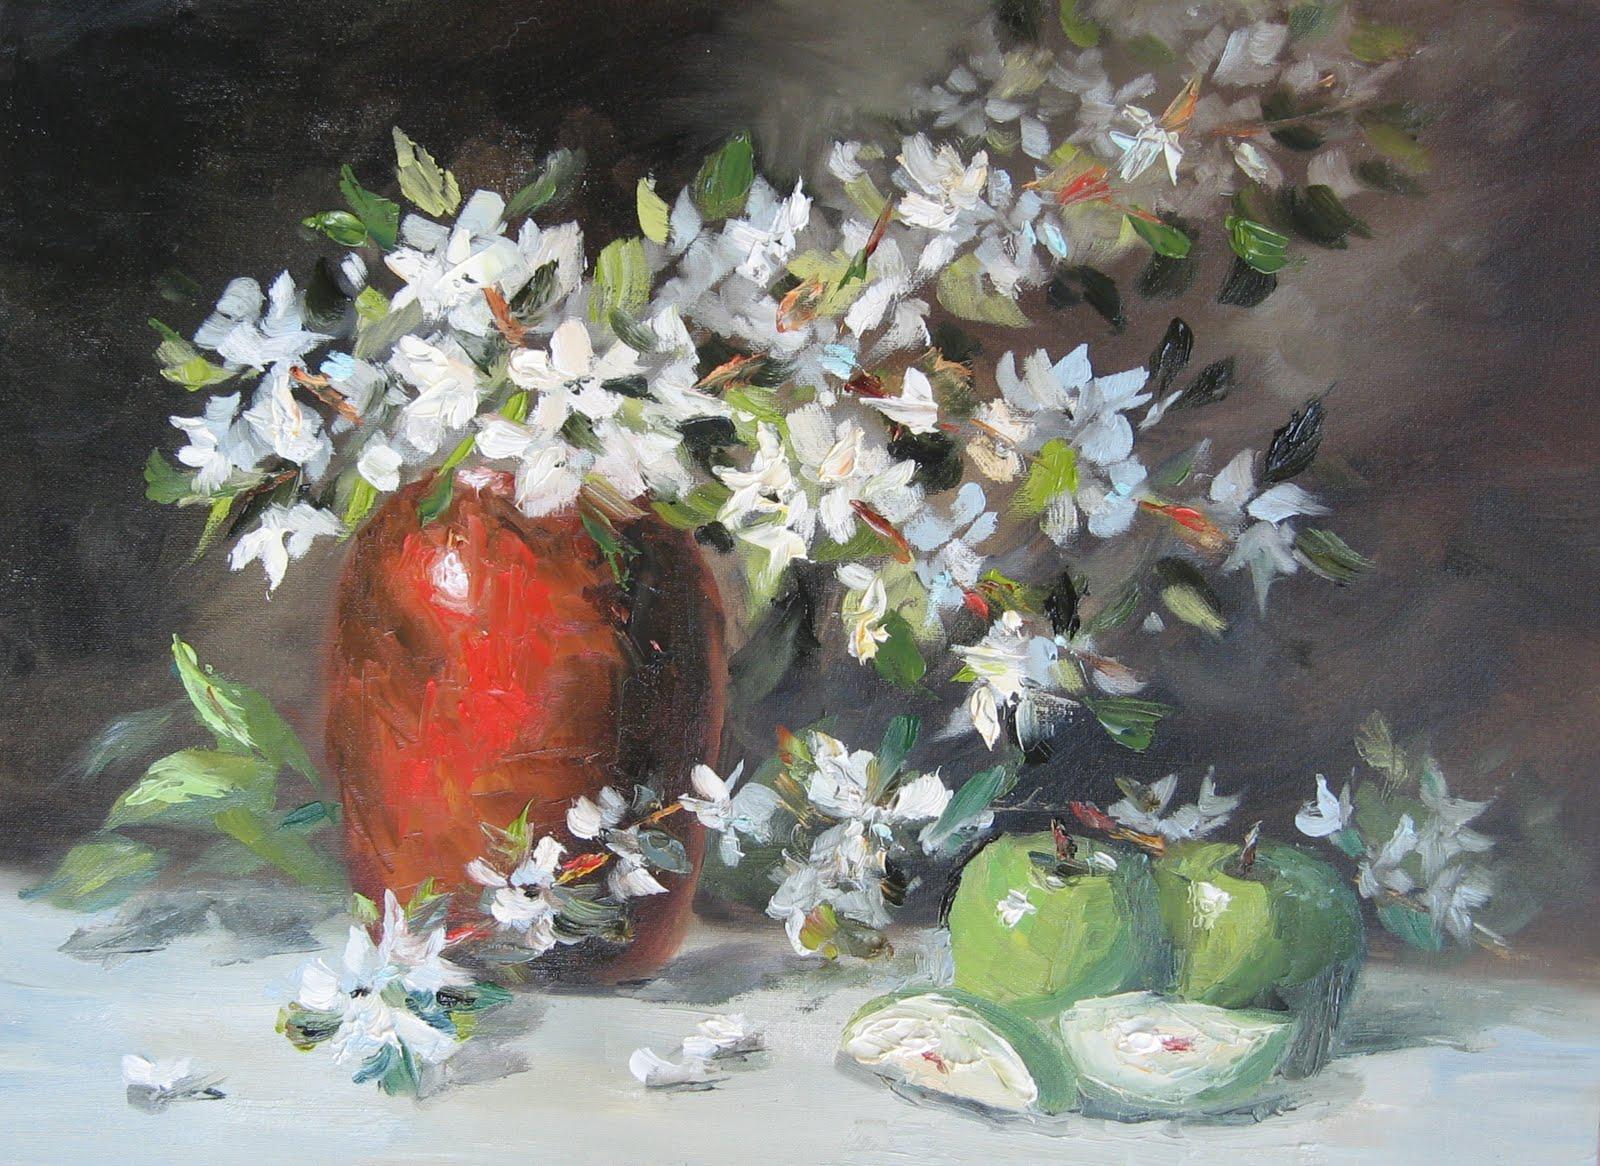 """Flower Study #17"" original fine art by Pat Fiorello"